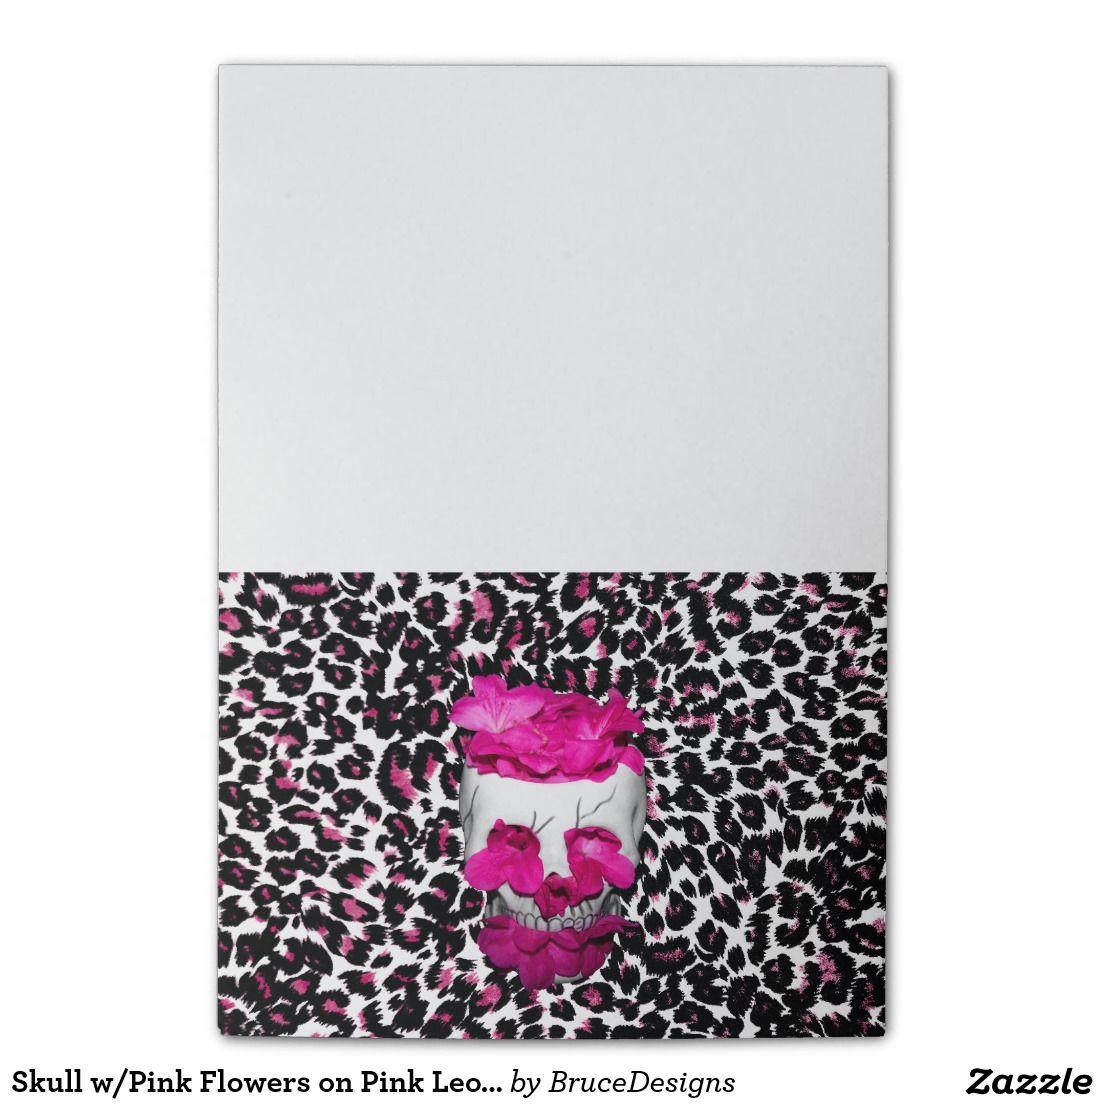 Skull wpink flowers on pink leopard print post it notes skull wpink flowers on pink leopard print post it notes mightylinksfo